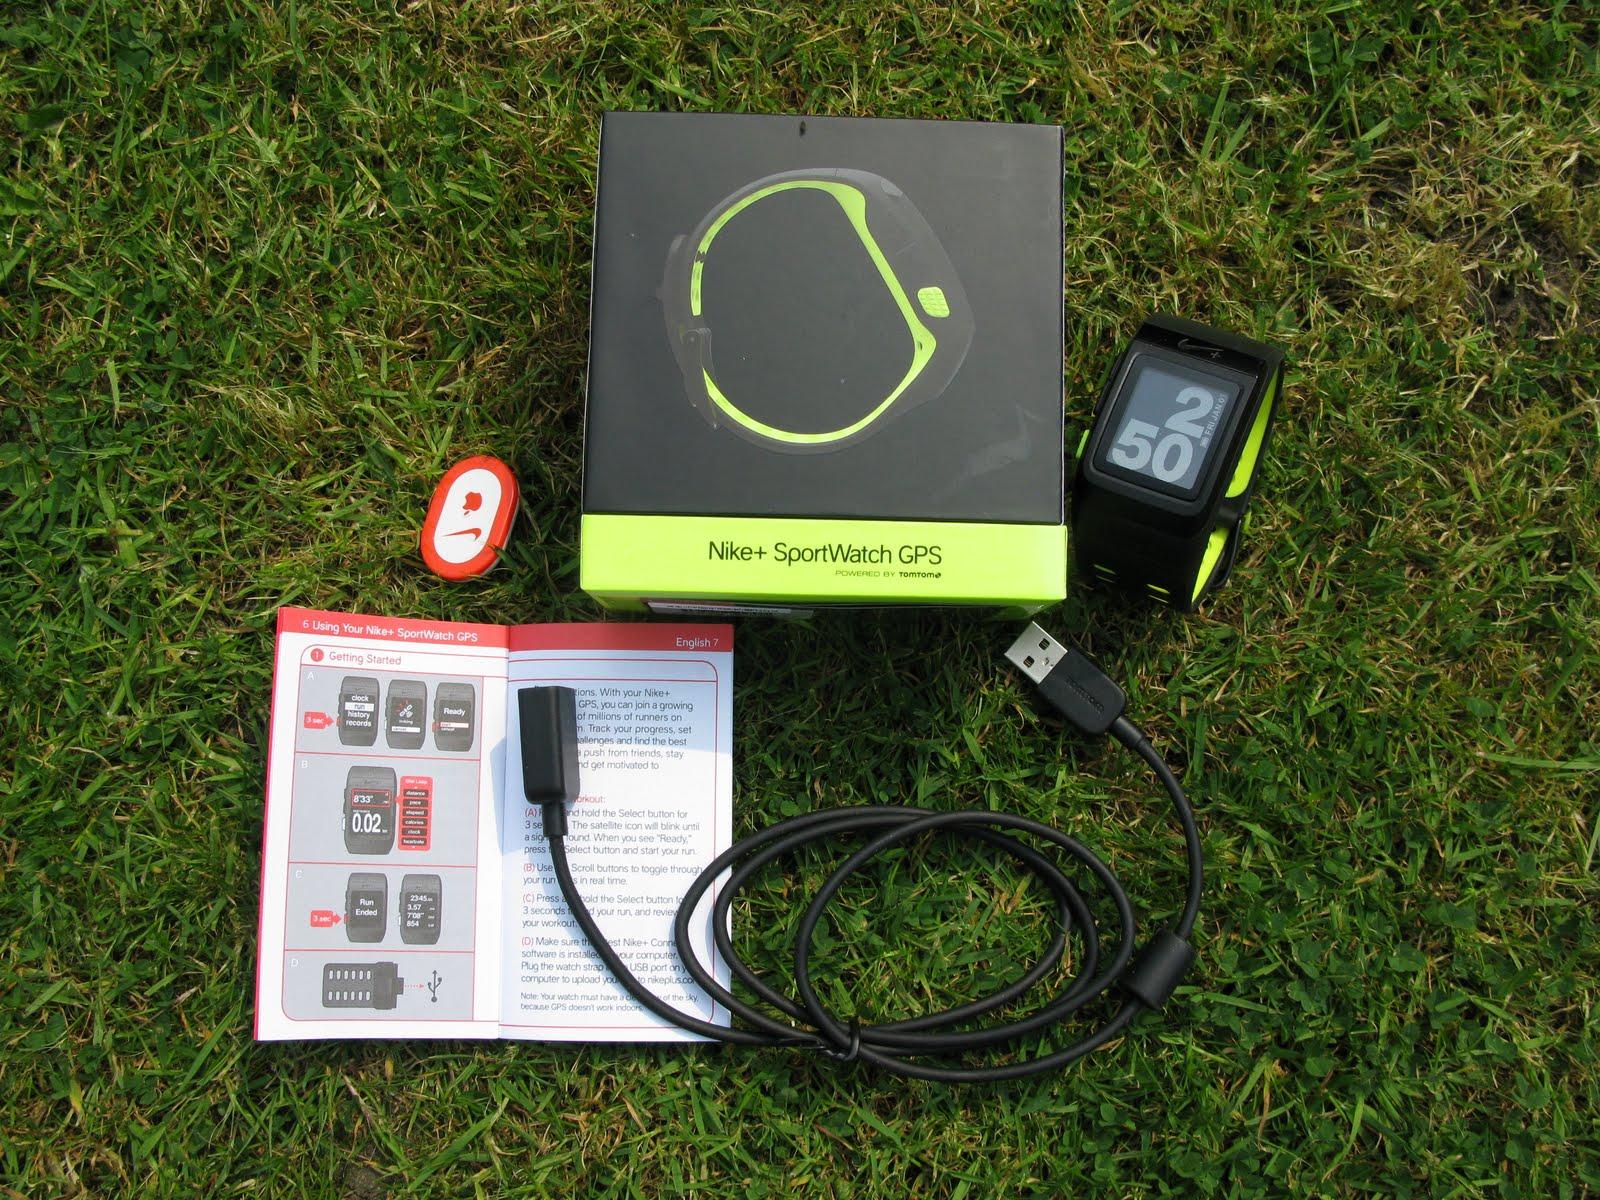 nike gps manual daily instruction manual guides u2022 rh testingwordpress co Nike Cardio Watch Nike Cardio Watch